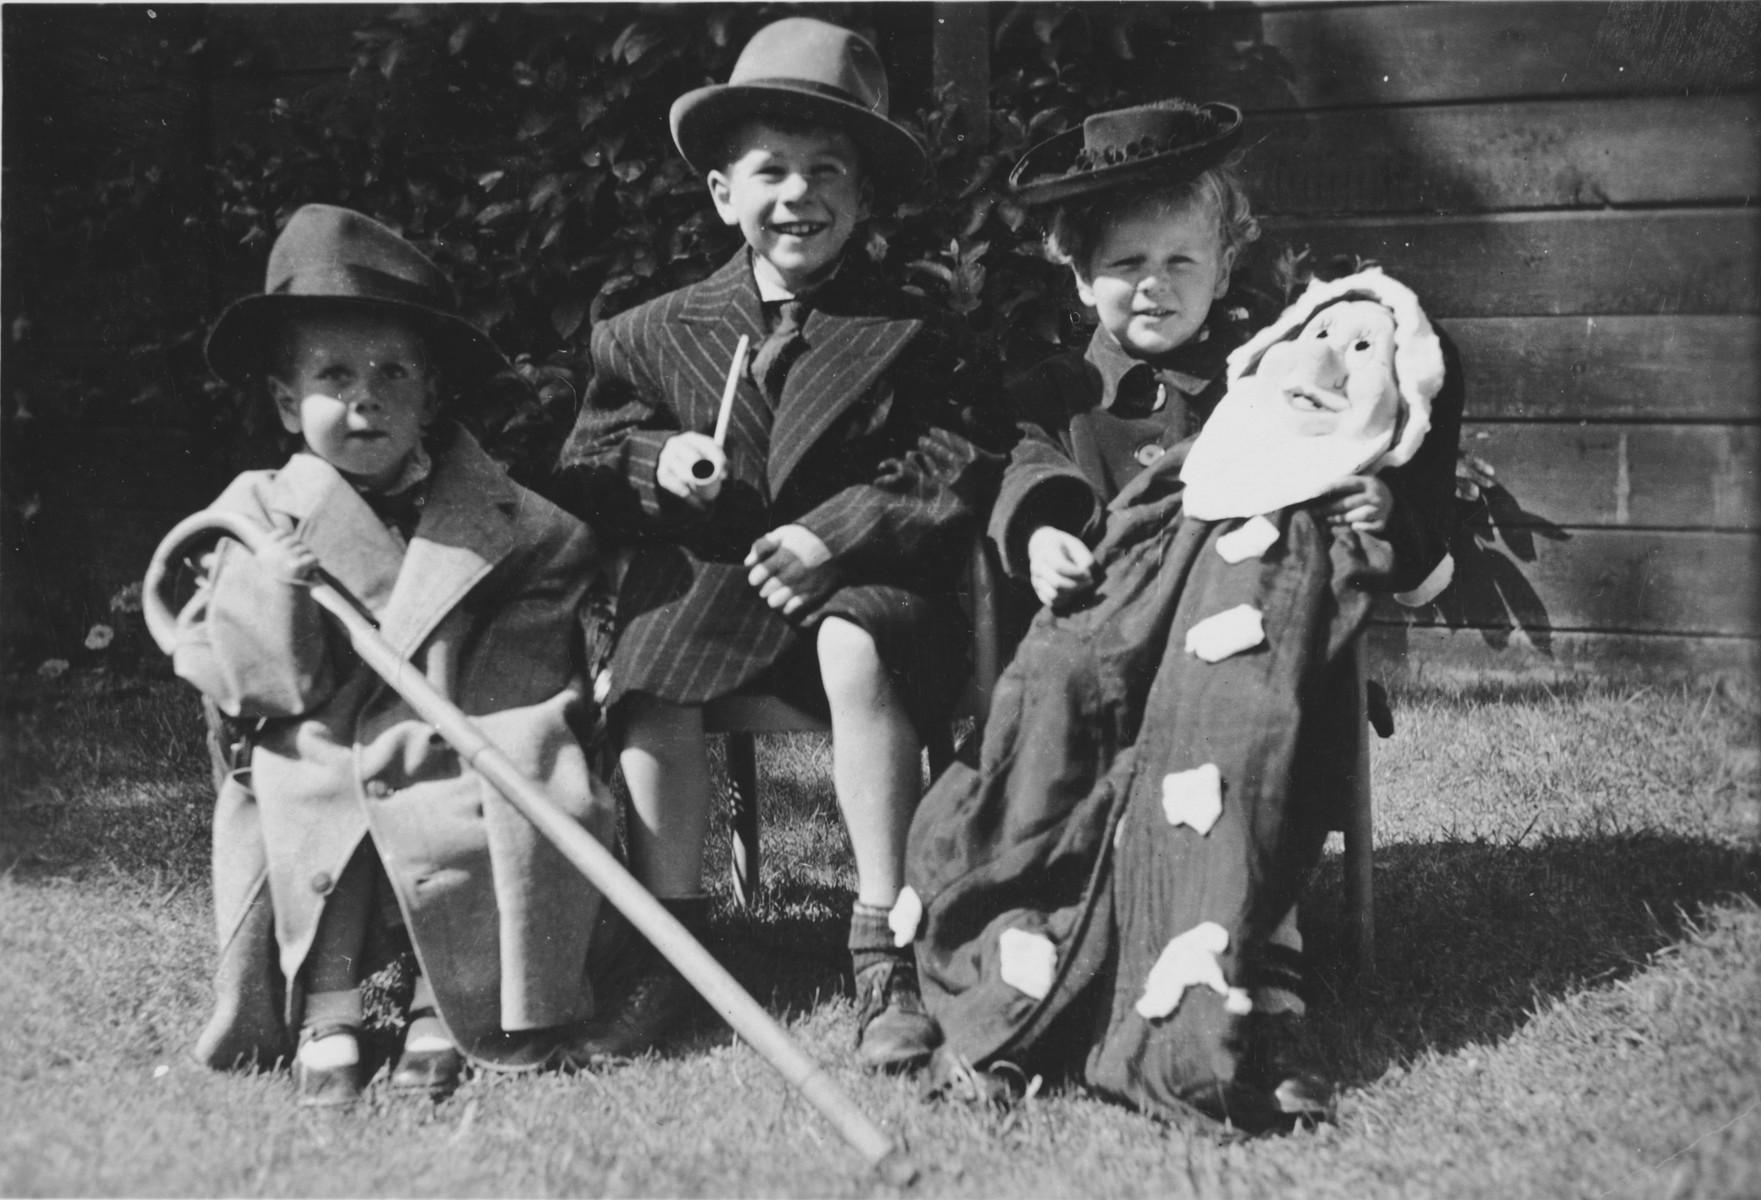 Group portrait of a three Jewish Dutch children wearing costumes.